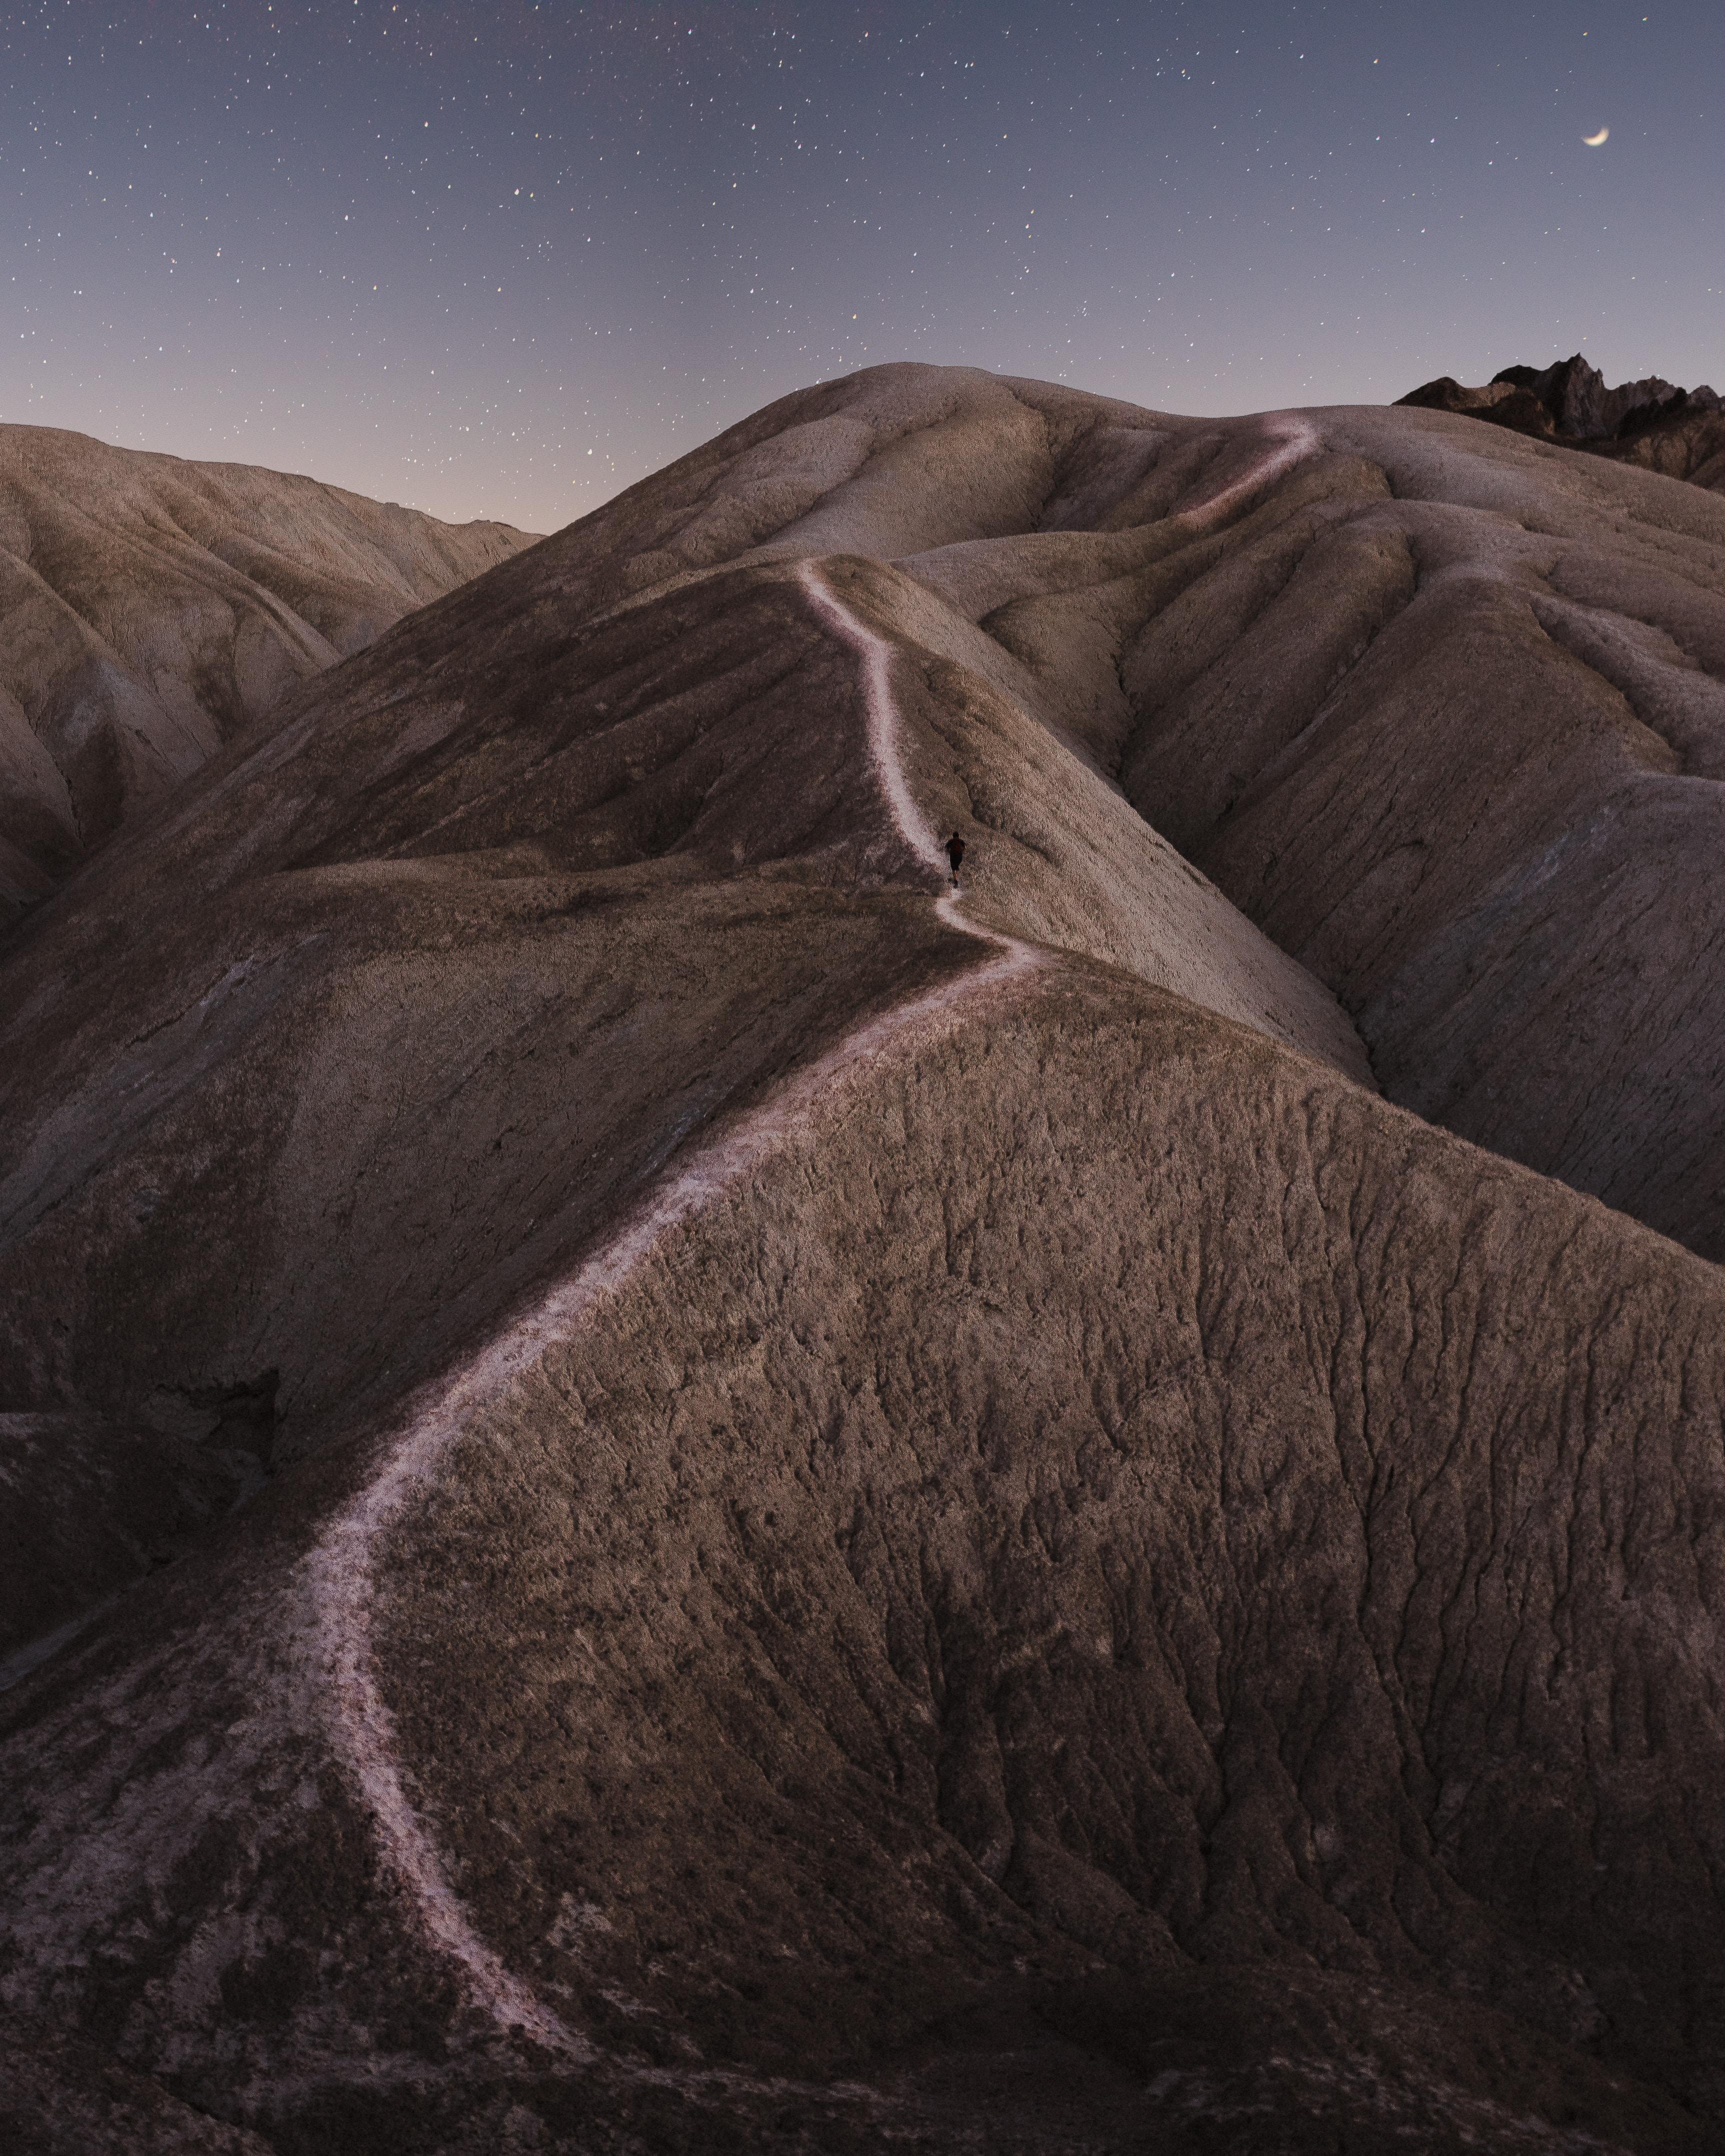 landscape photograph ofmountain range